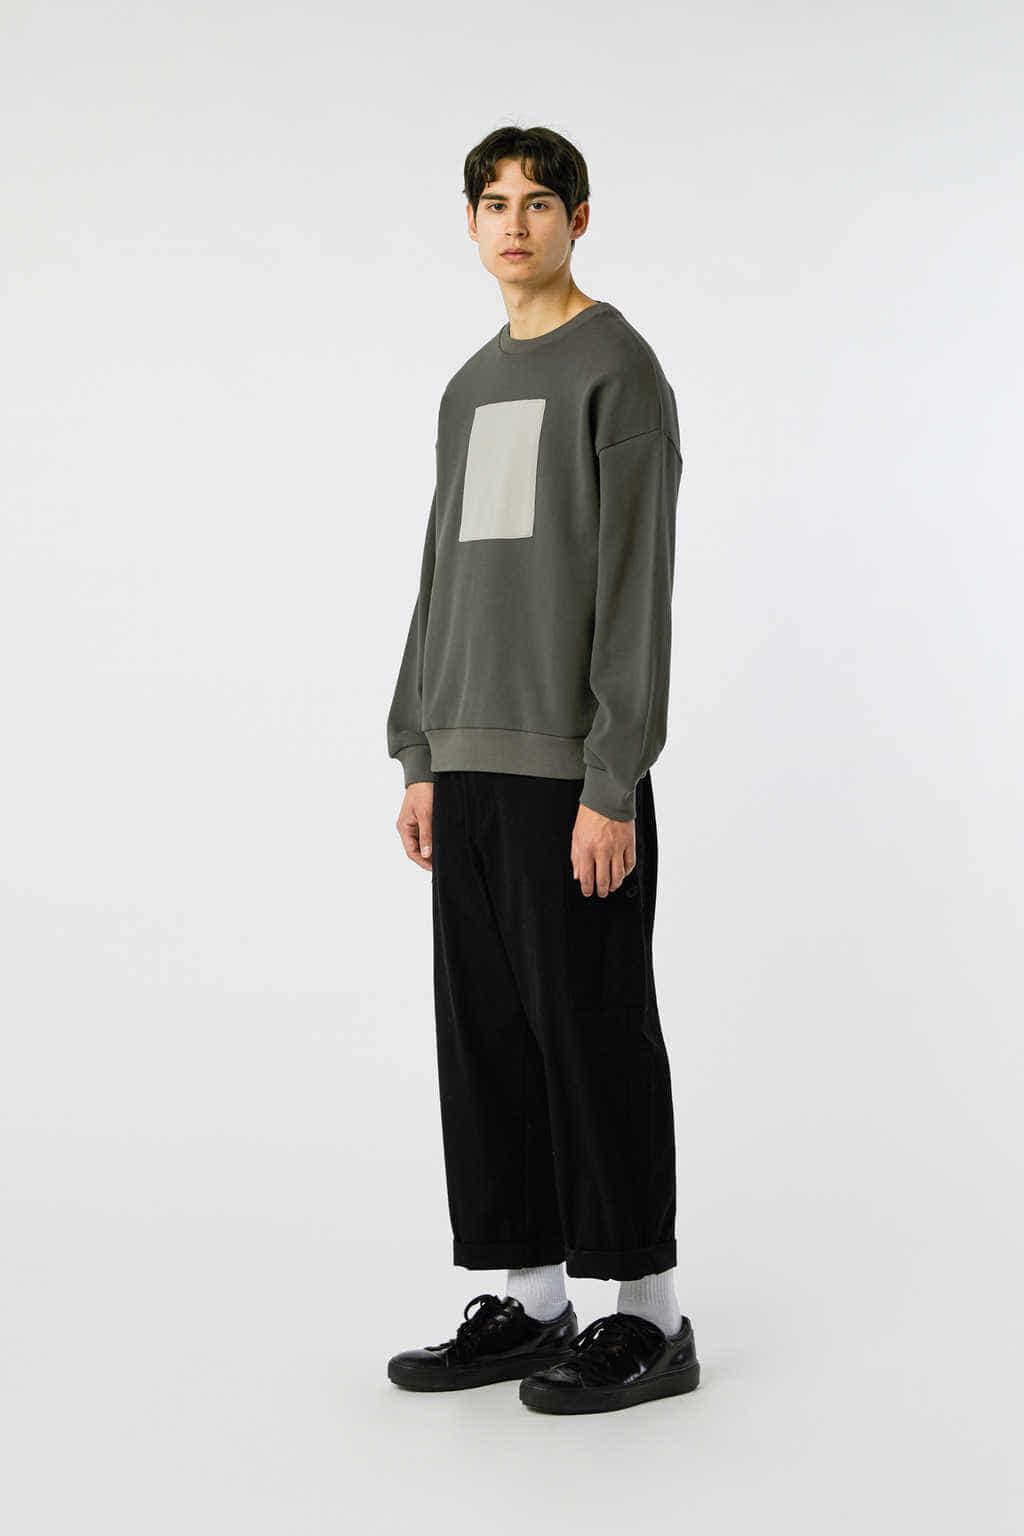 Sweatshirt 3138 Olive 8